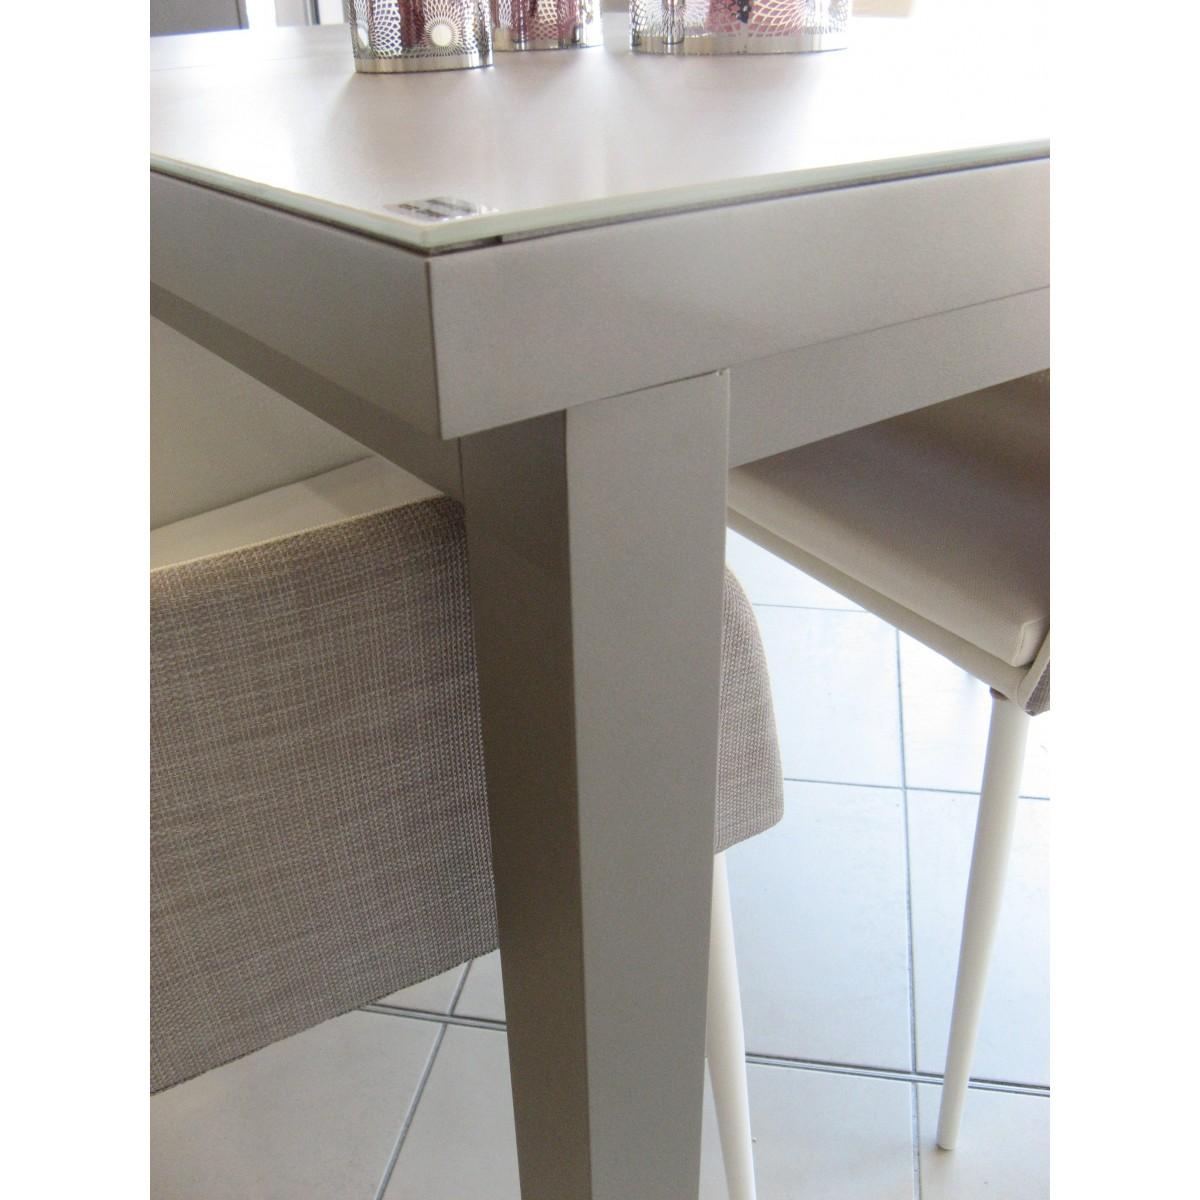 ikea meuble tv henin beaumont sammlung von. Black Bedroom Furniture Sets. Home Design Ideas